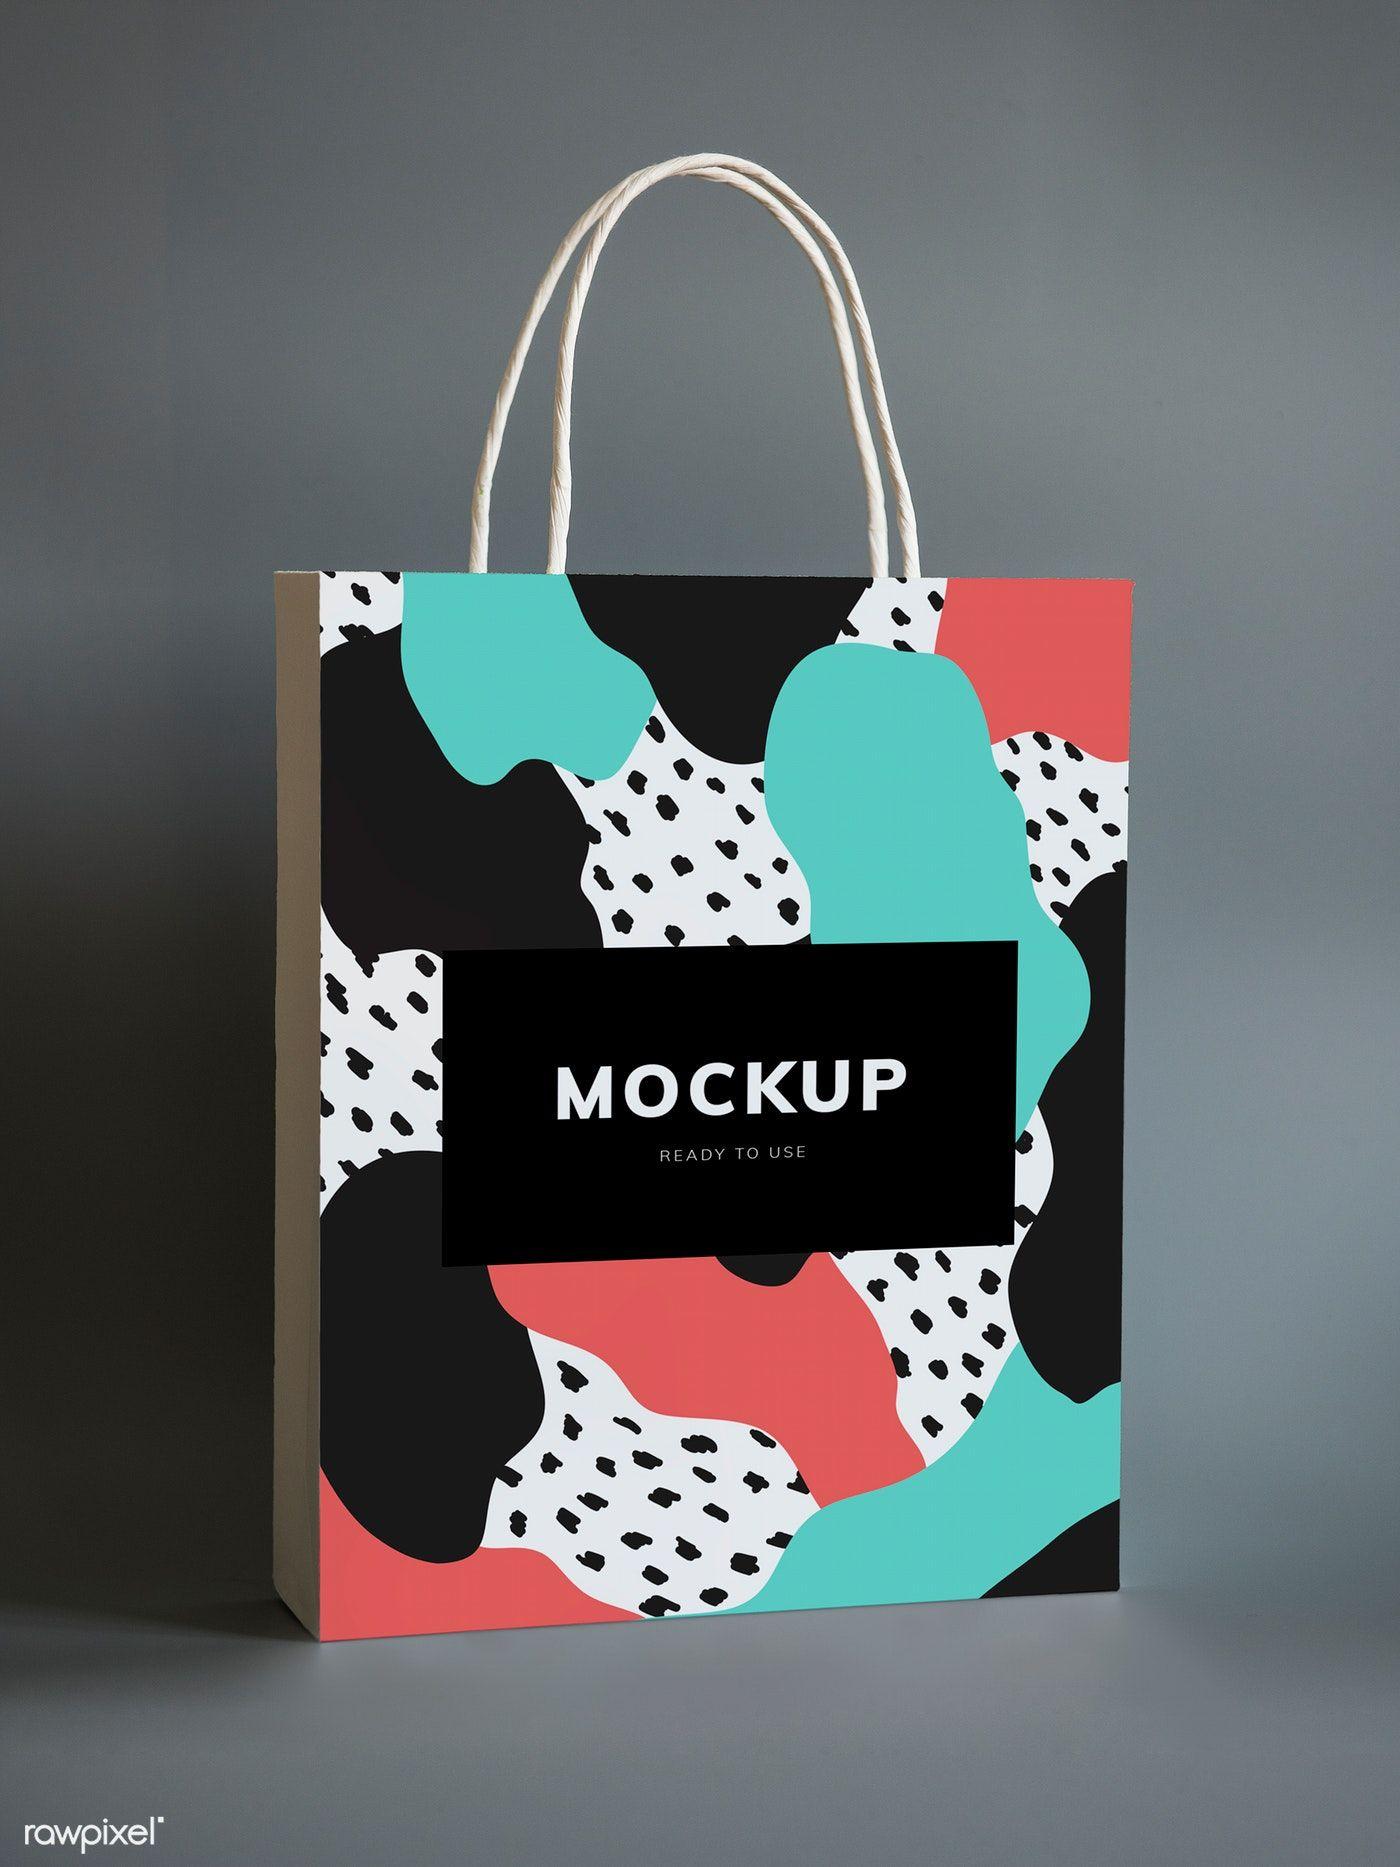 Download Download Premium Psd Of Colorful Shopping Paper Bag Mockup 502767 Paper Bag Design Bag Mockup Paper Bag